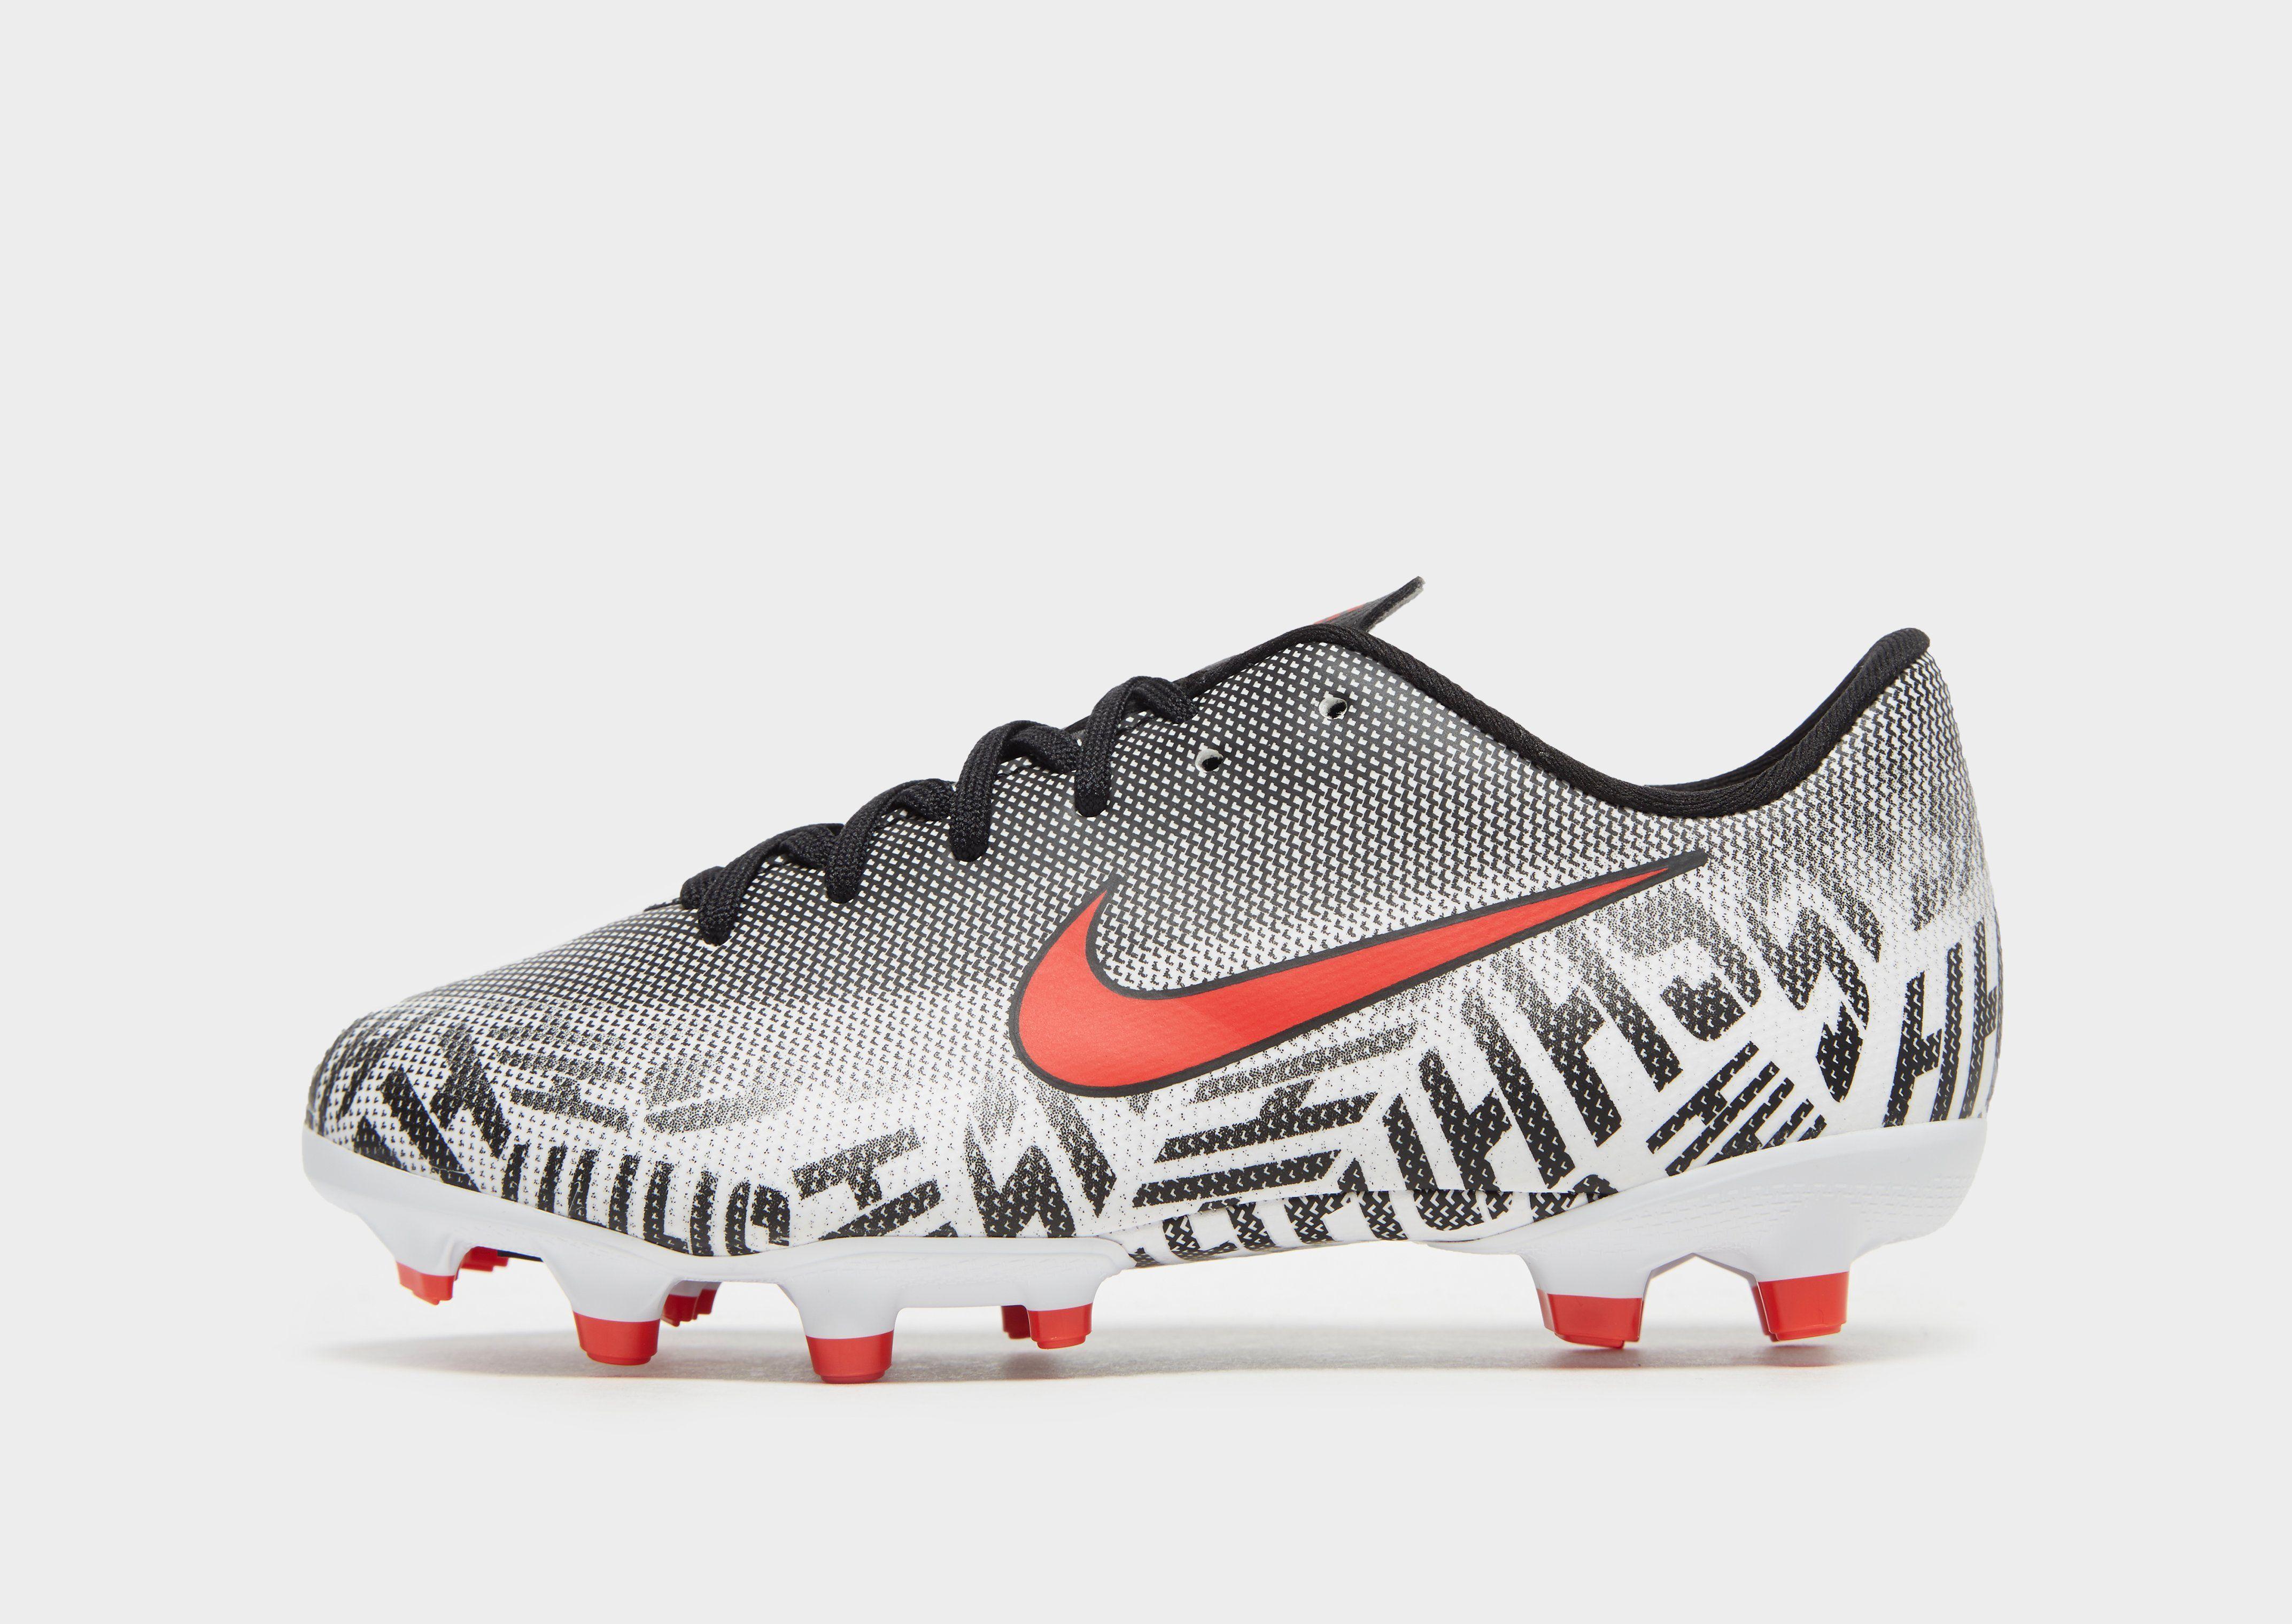 9a0eeee97785 NIKE Nike Jr. Mercurial Vapor XII Academy Neymar Jr Younger Older Kids   Multi-Ground Football Boot